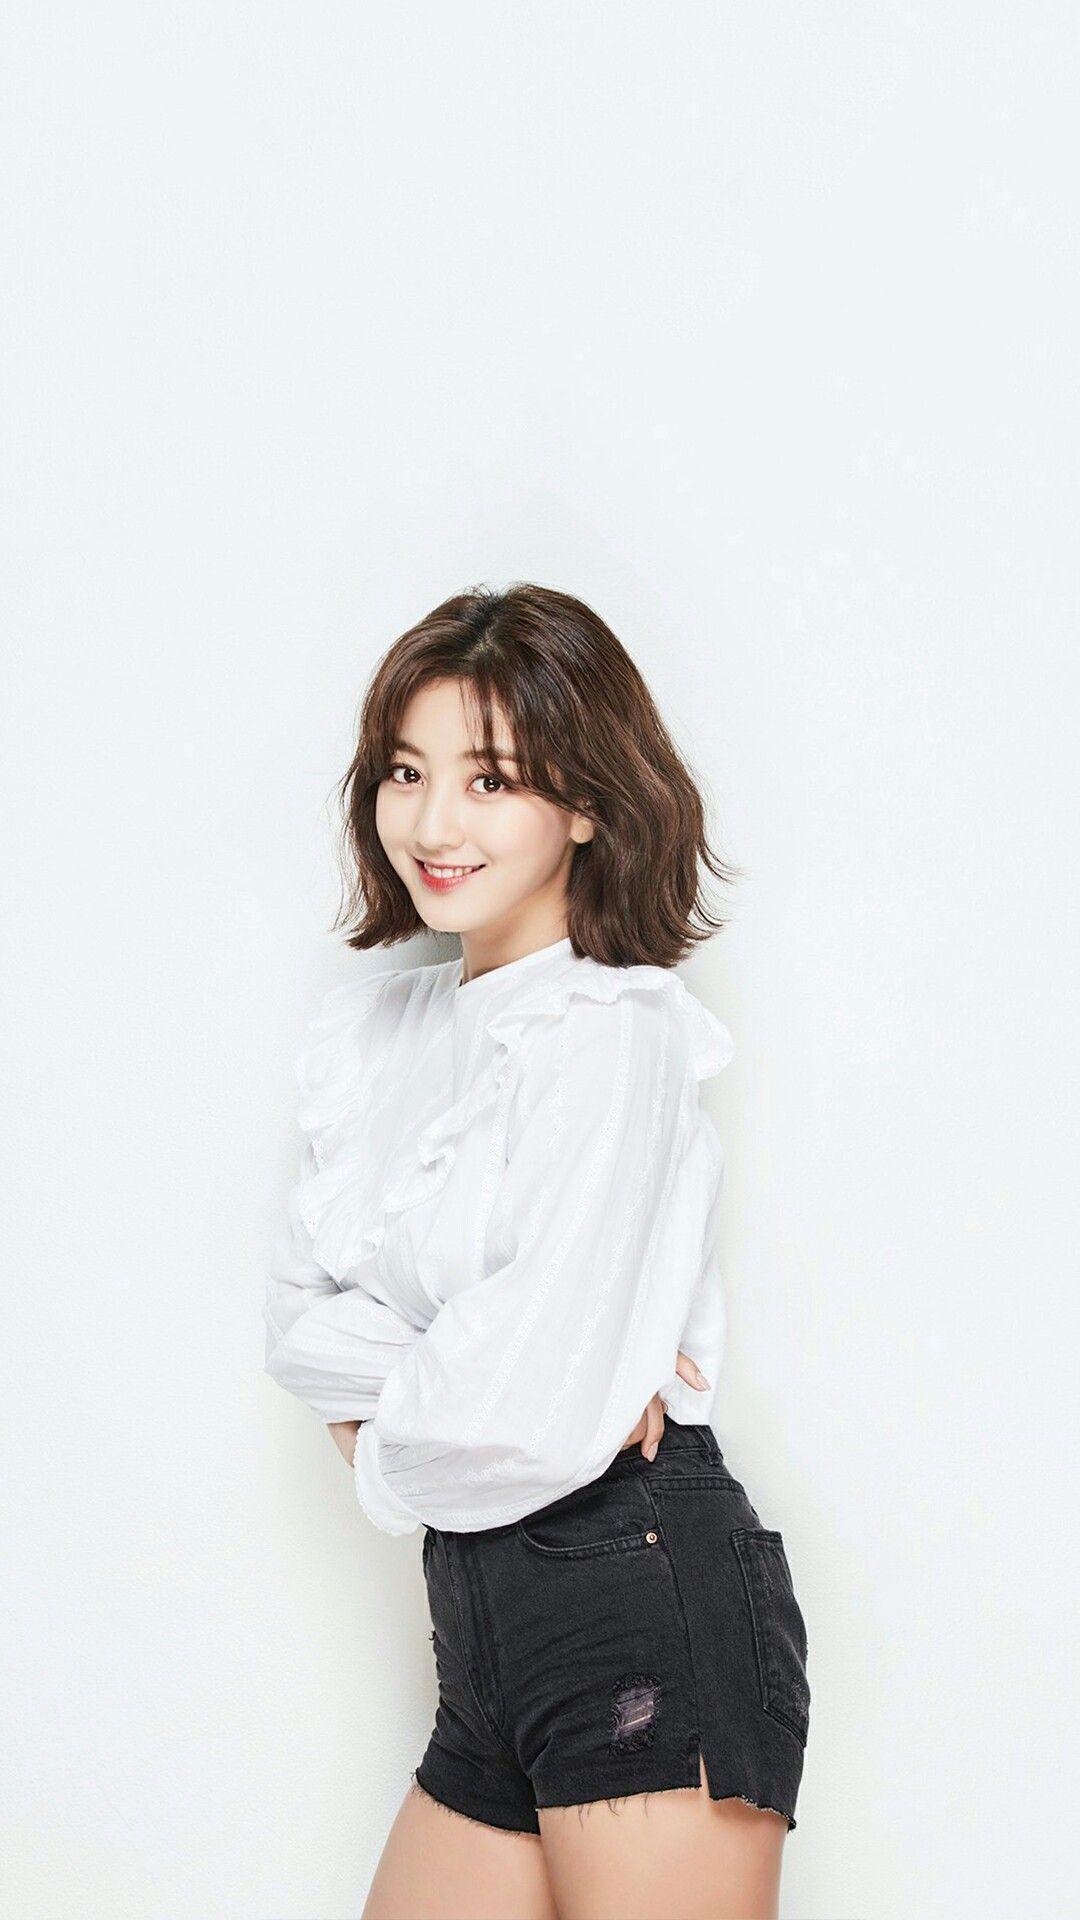 Twice X Ohboy 2018 Kpop Wallpaper Lockscreen Sana Chaeyoung Momo